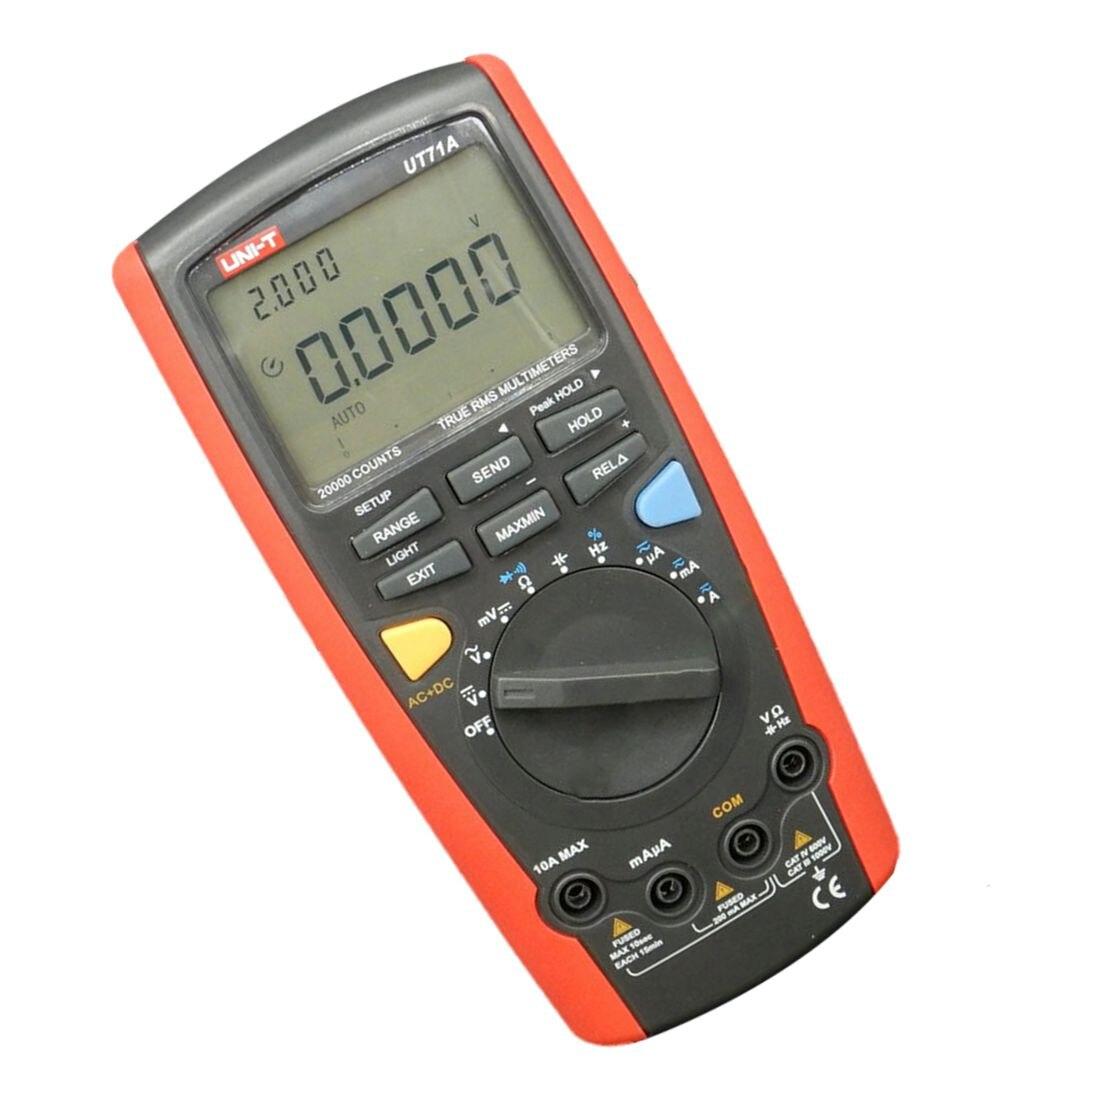 UNI-T 1 set UT71A Intelligent Digital Multimeters CD Digital AC DC current voltage USB true Resistance Tester Ammeter Multites мультиметр uni t uni t ut71b alicate amperimetro ac dc